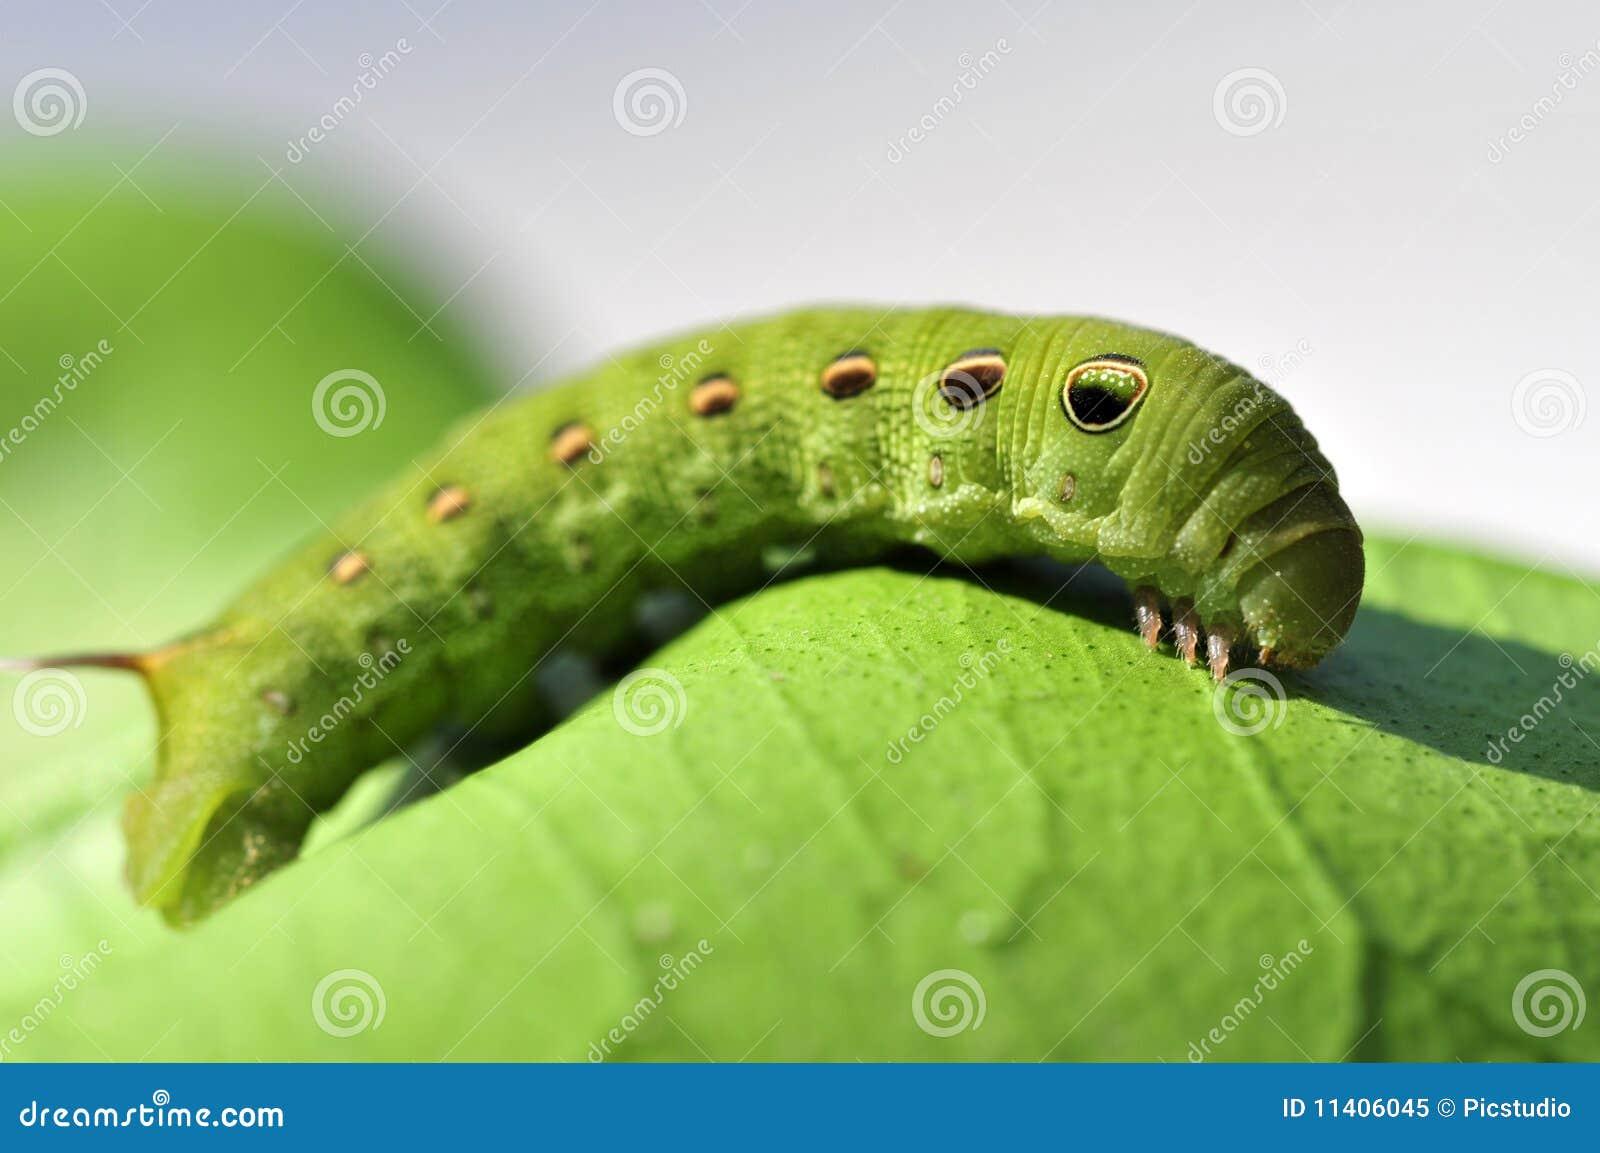 Green Caterpillar Royalty Free Stock Photo - Image: 11406045